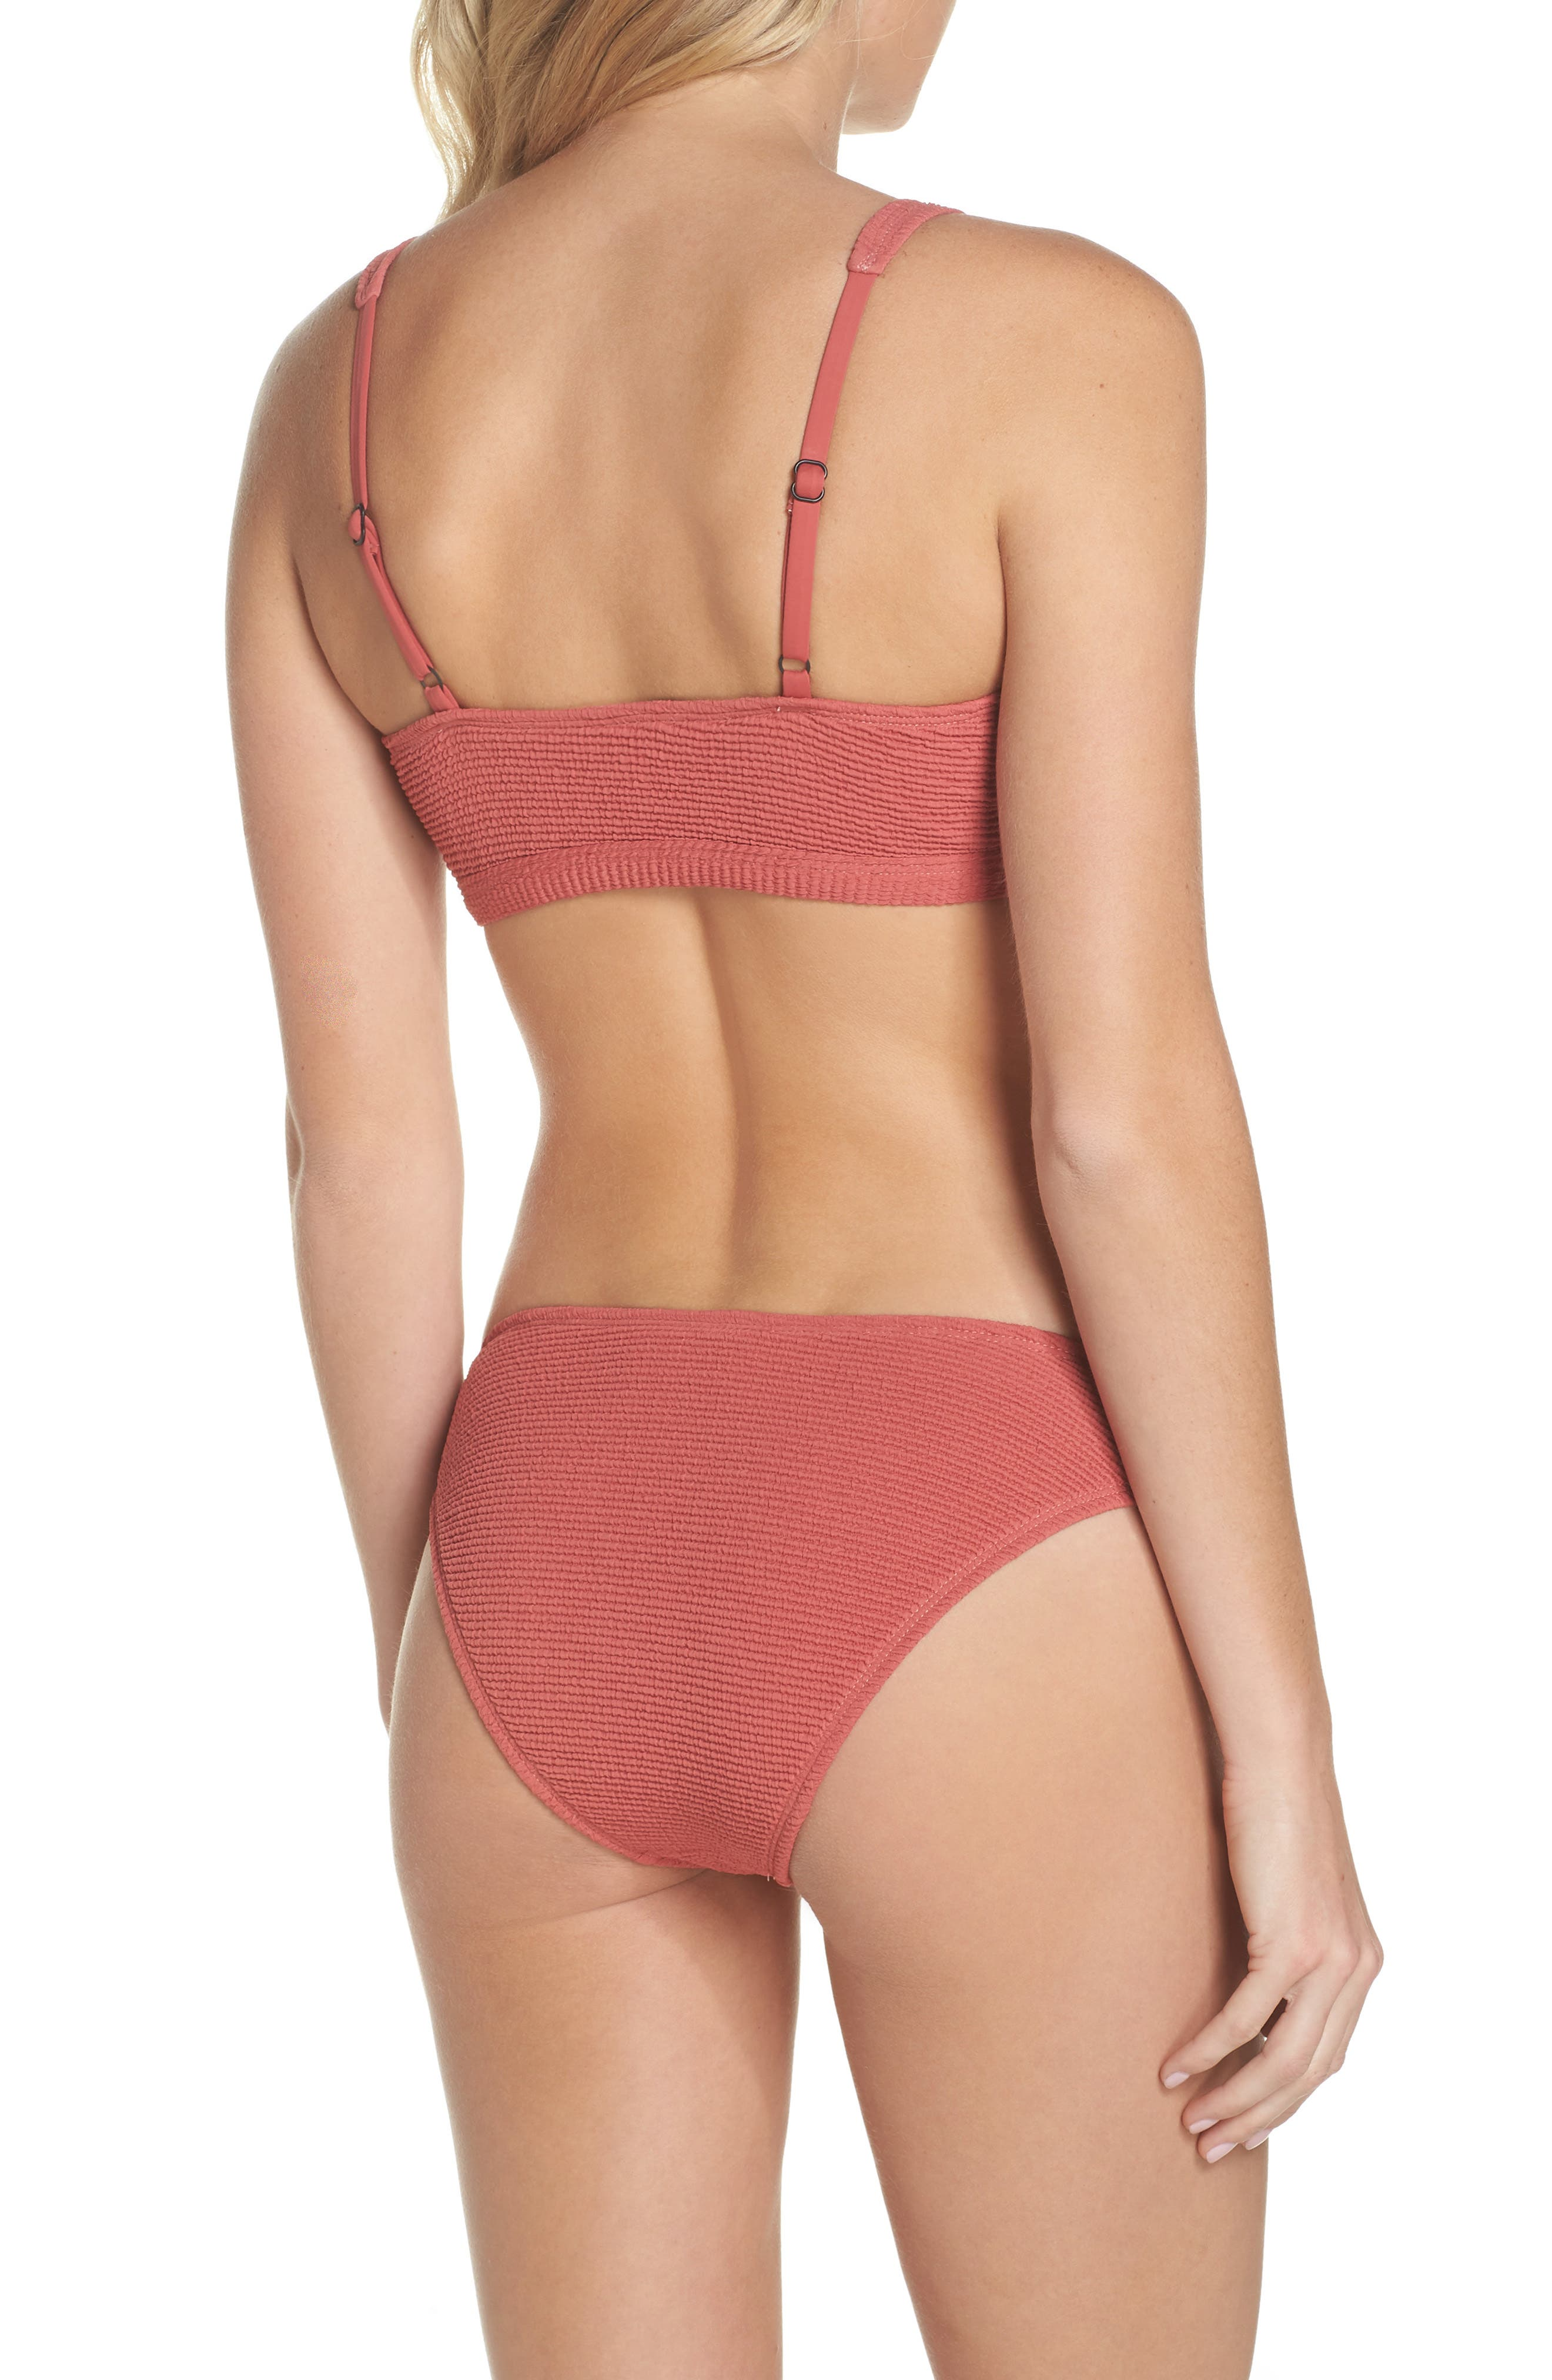 Malibu Bikini Top,                             Alternate thumbnail 8, color,                             RED MINERAL